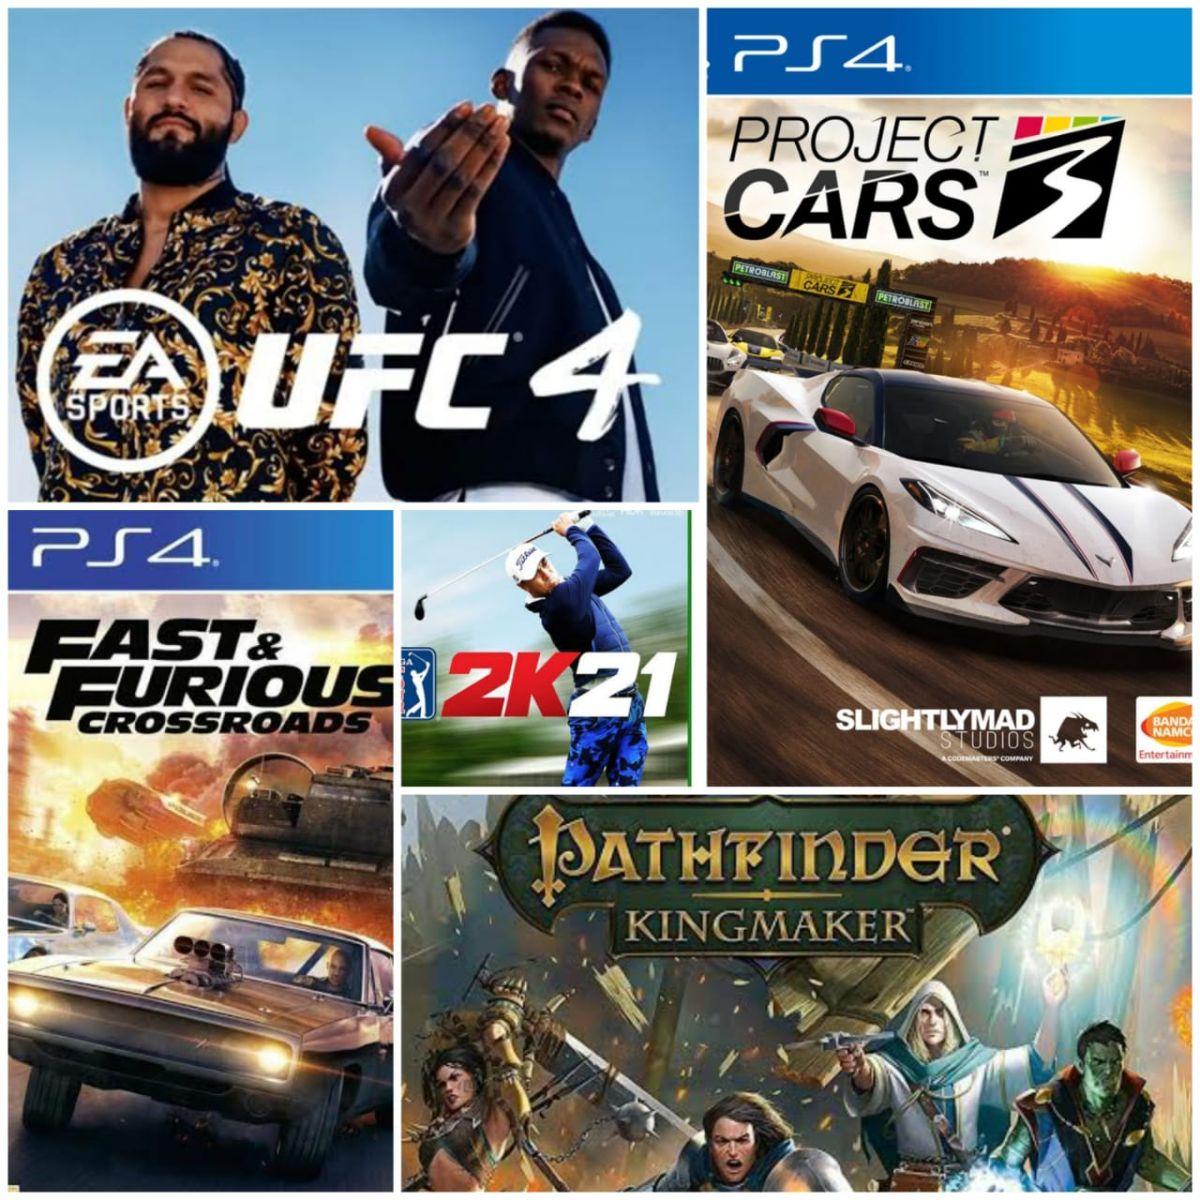 Project CARS 3, EA Sports UFC 4, Fast & Furious Crossroads, Pathfinder Kingmaker y PGA TOUR 2K21